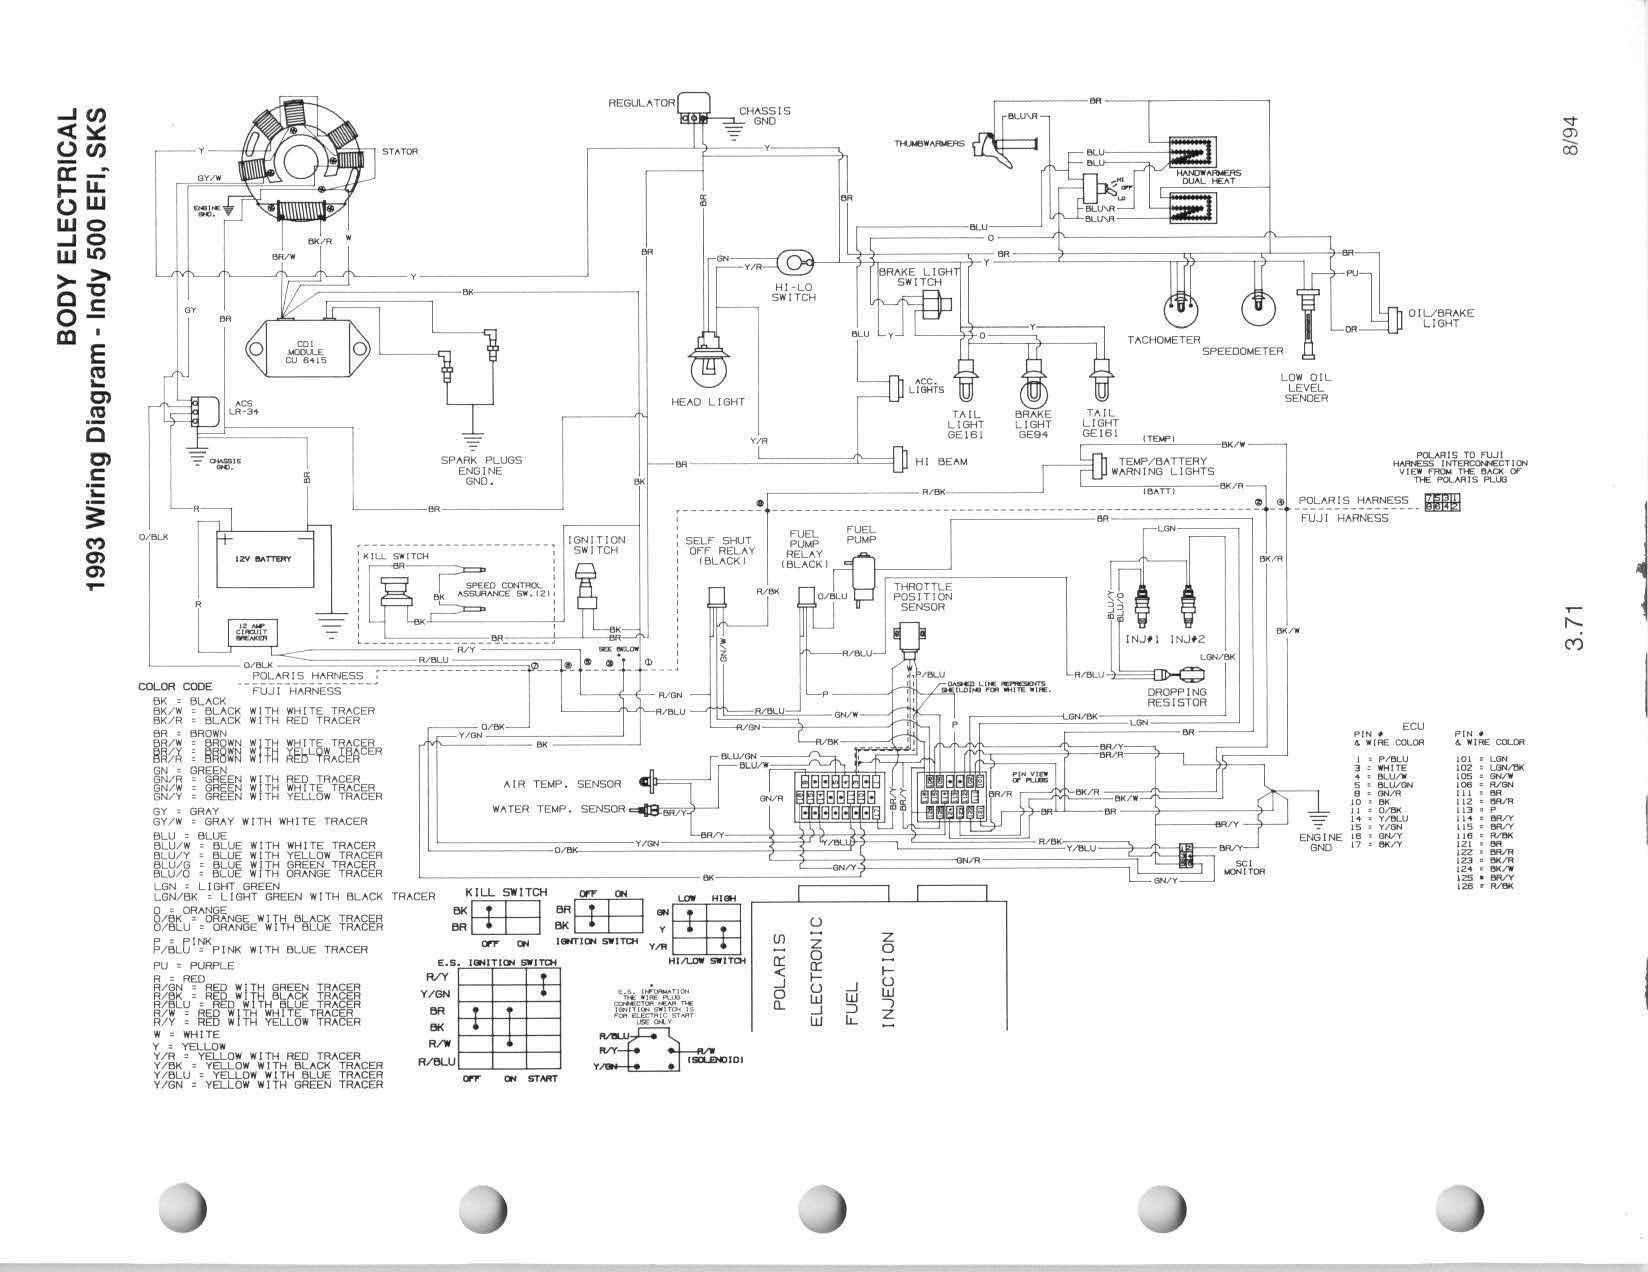 medium resolution of image result for battery wiring diagram for 2008 polaris atv